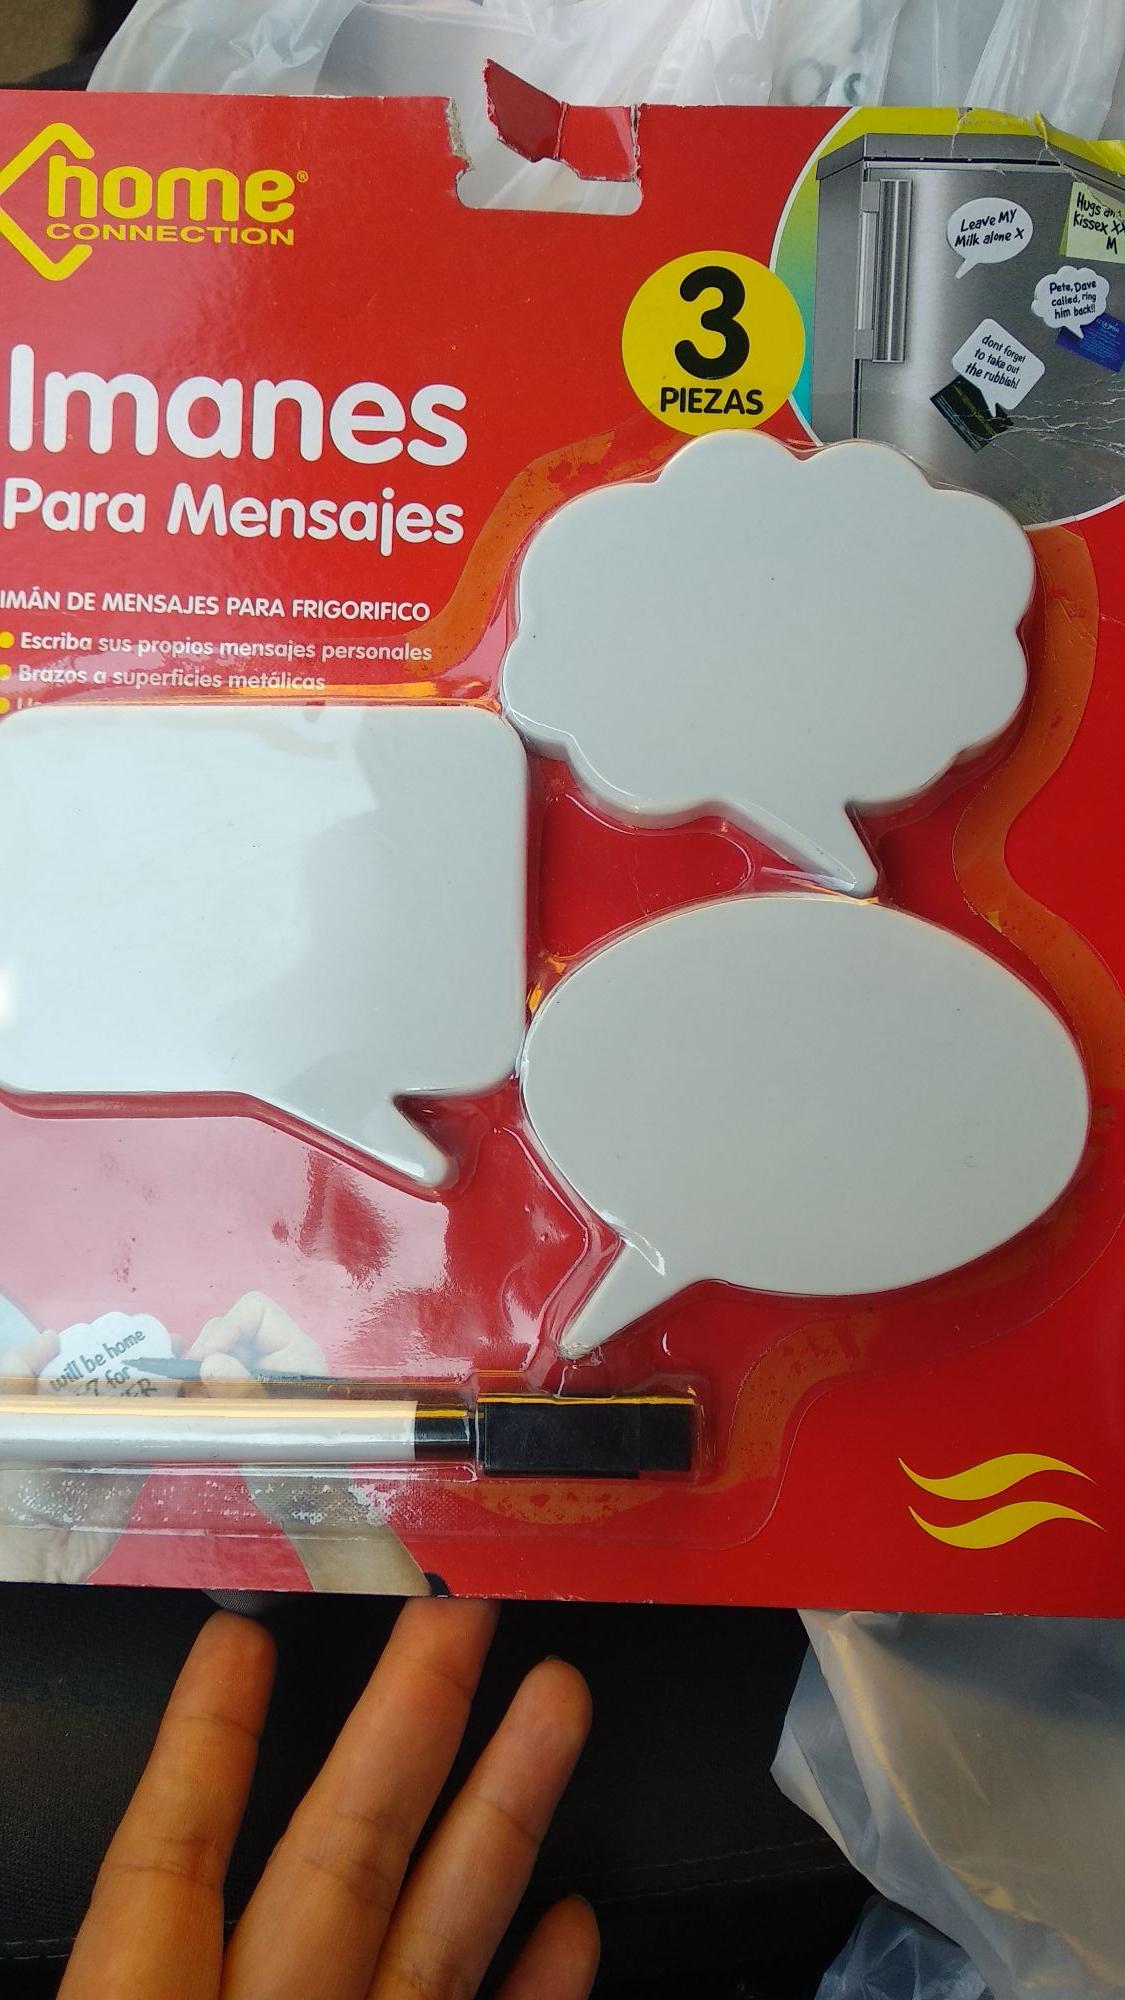 Chedraui Jalpa de Méndez: Paquete de Imanes para recados